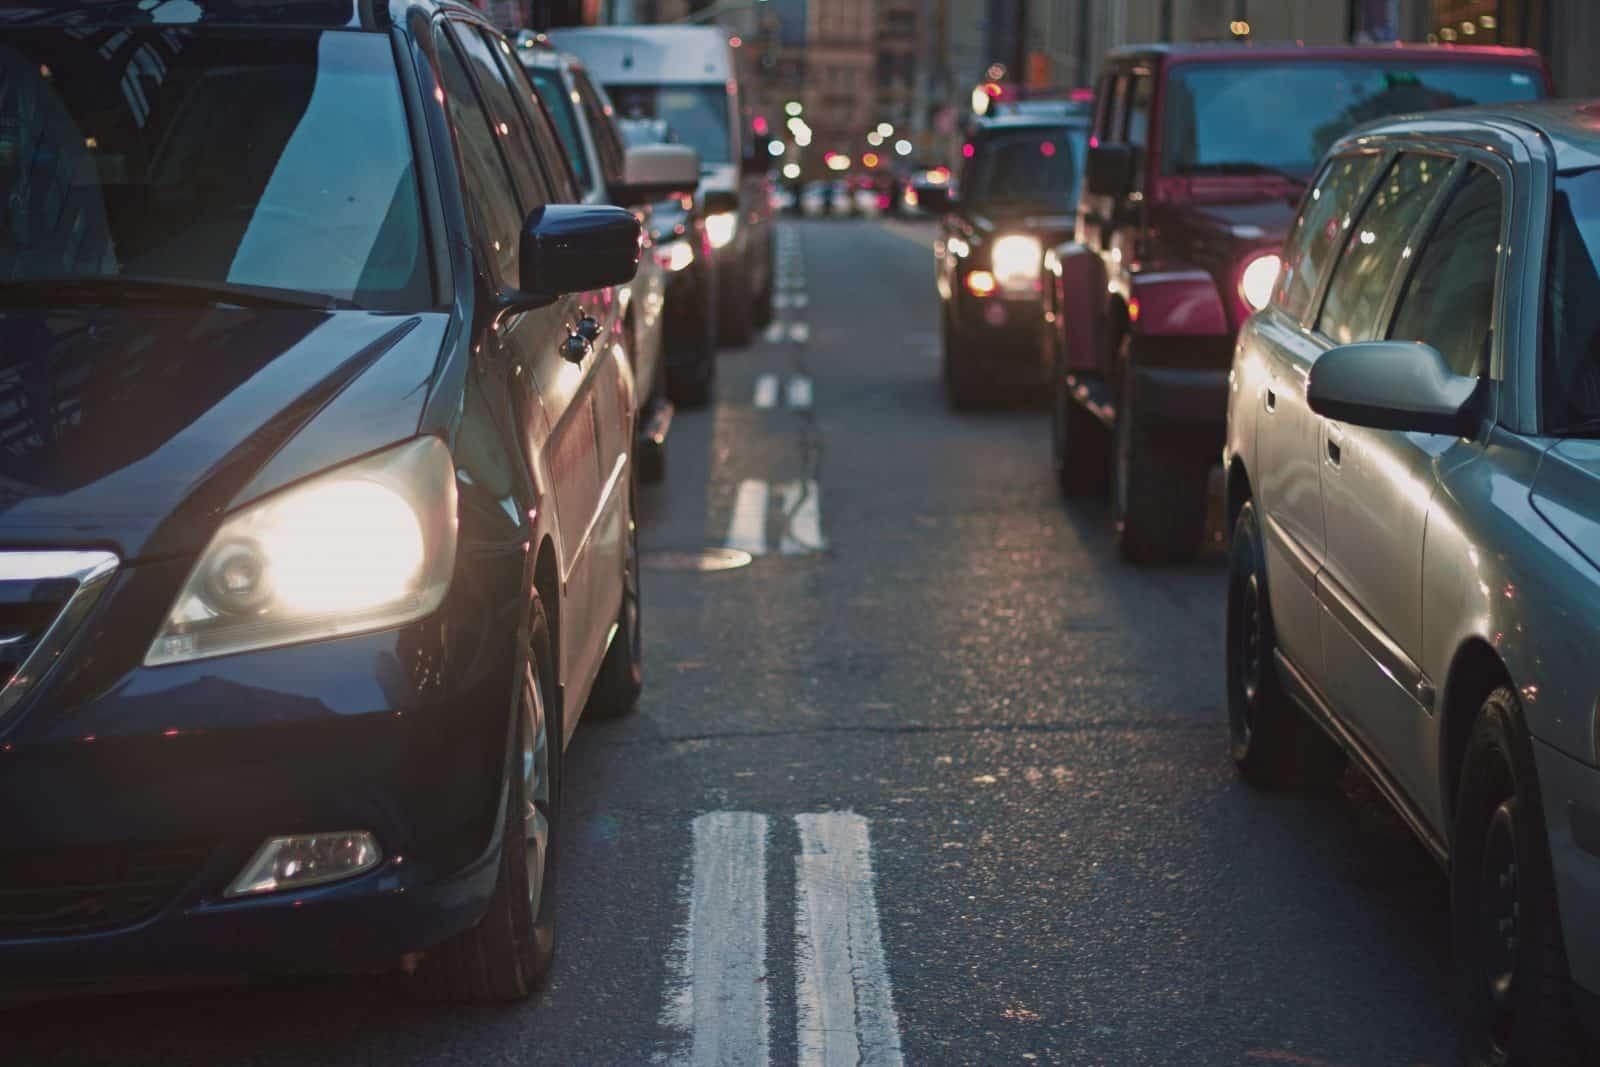 Cars in traffic.